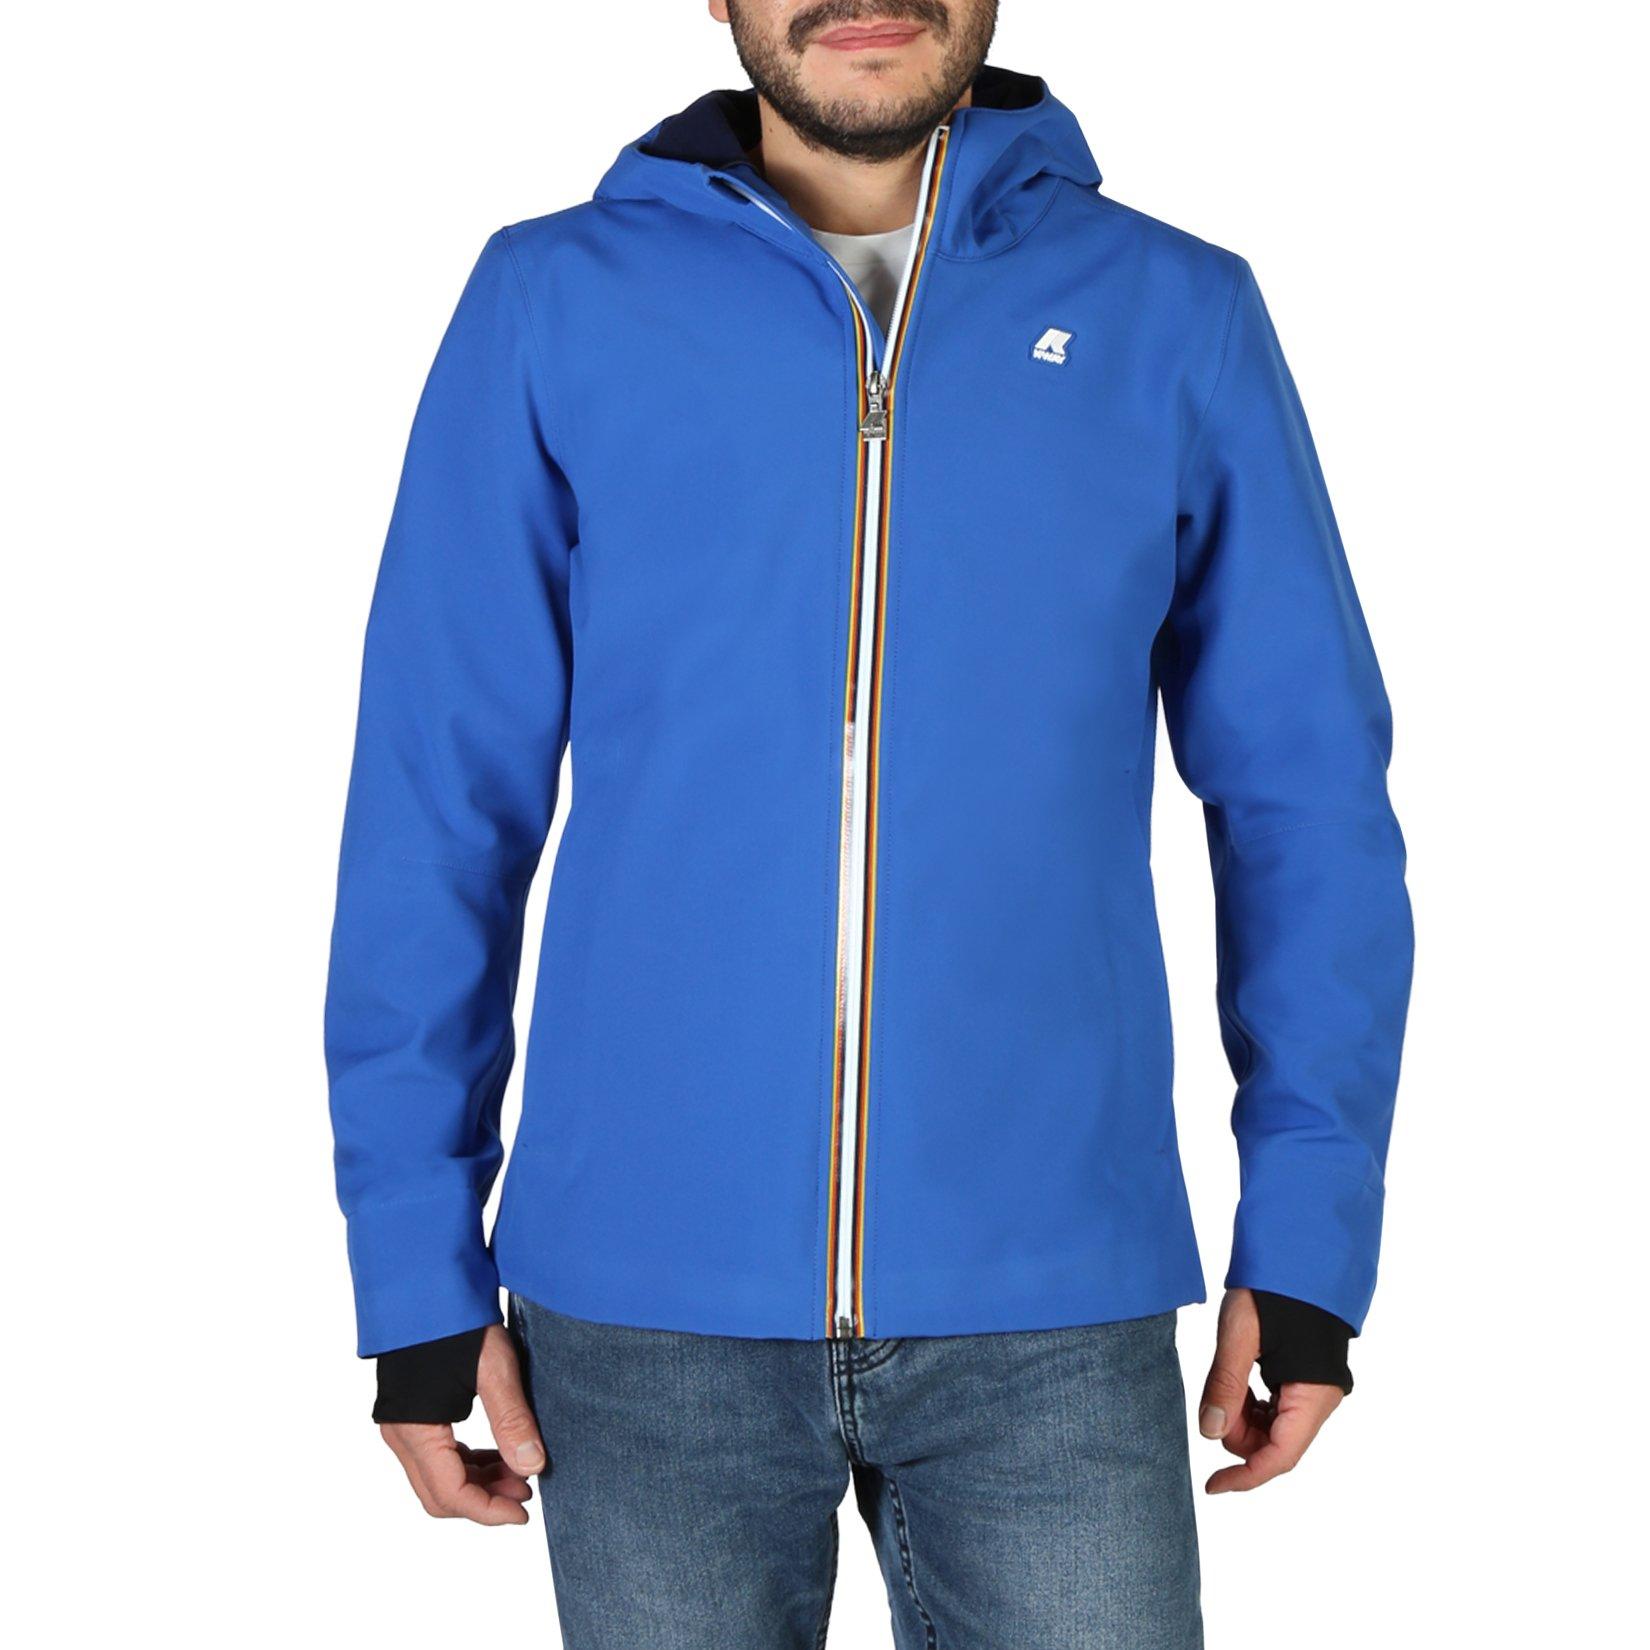 K-Way Men's Jacket Various Colours JACK-BONDED-K008J00 - blue M